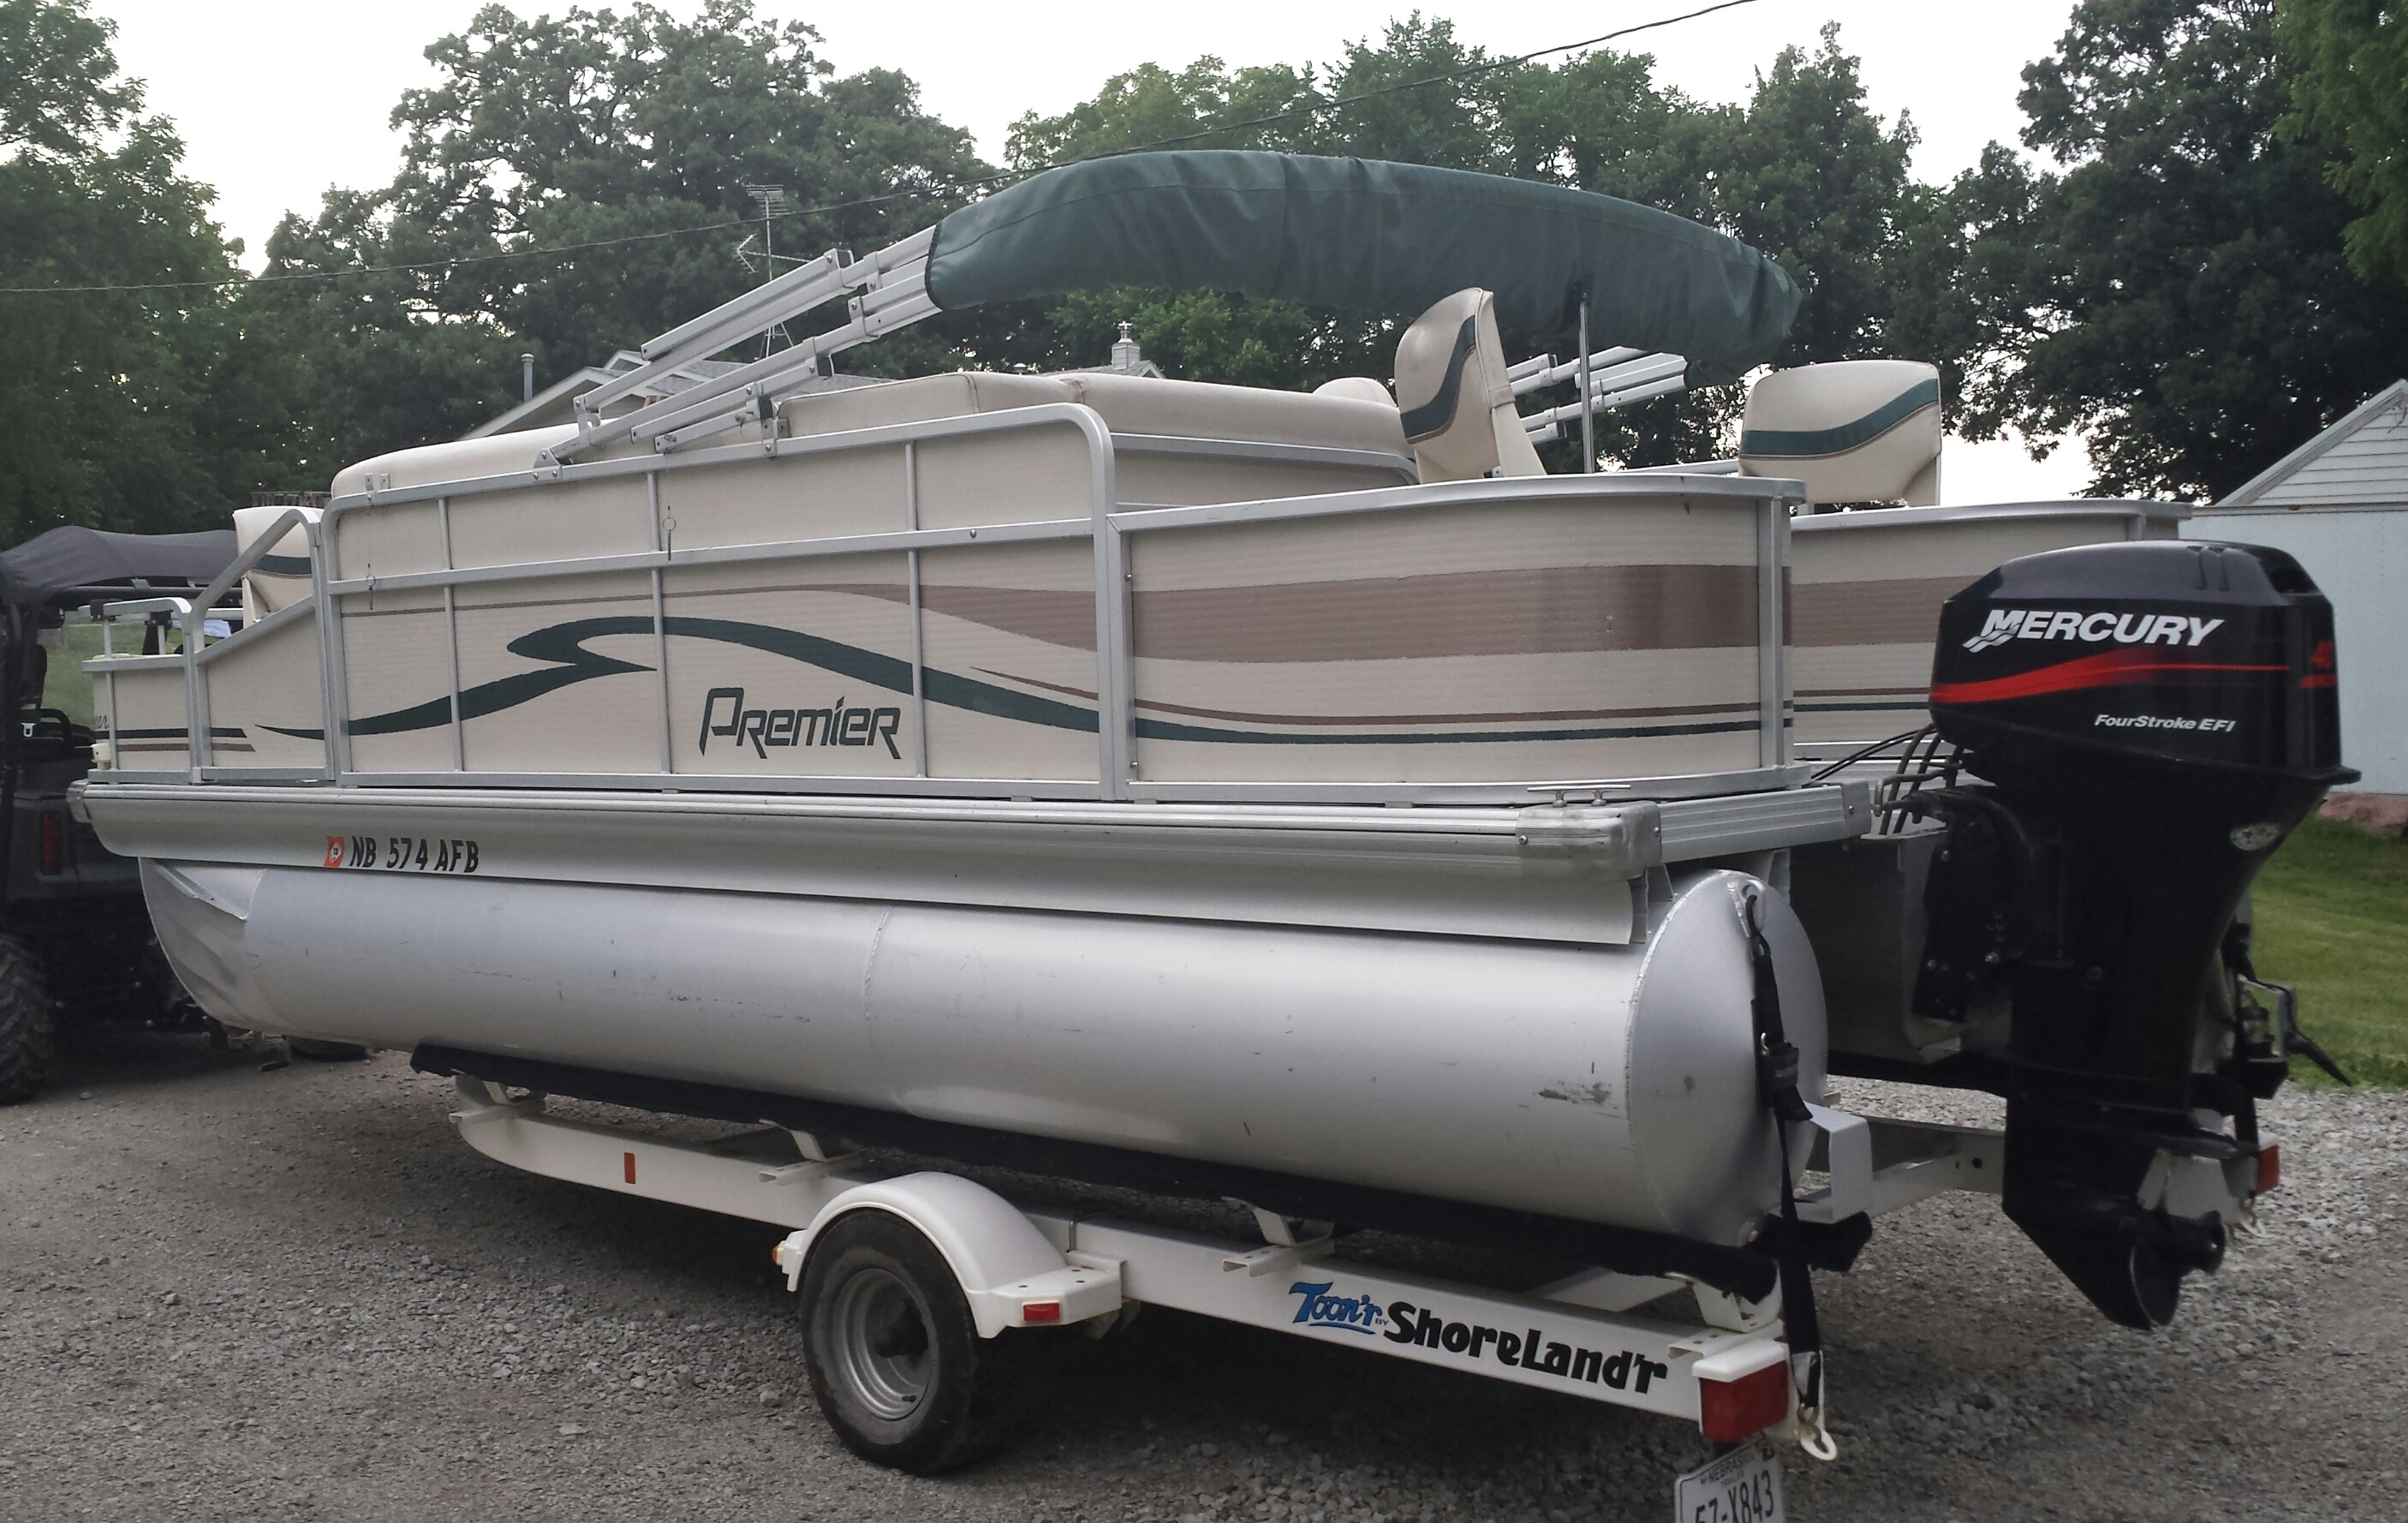 Acreage Tractor 5th Wheel Camper Pontoon Boat Utv Vehicles Shorelander Trailer Wiring Harness Photo Gallery